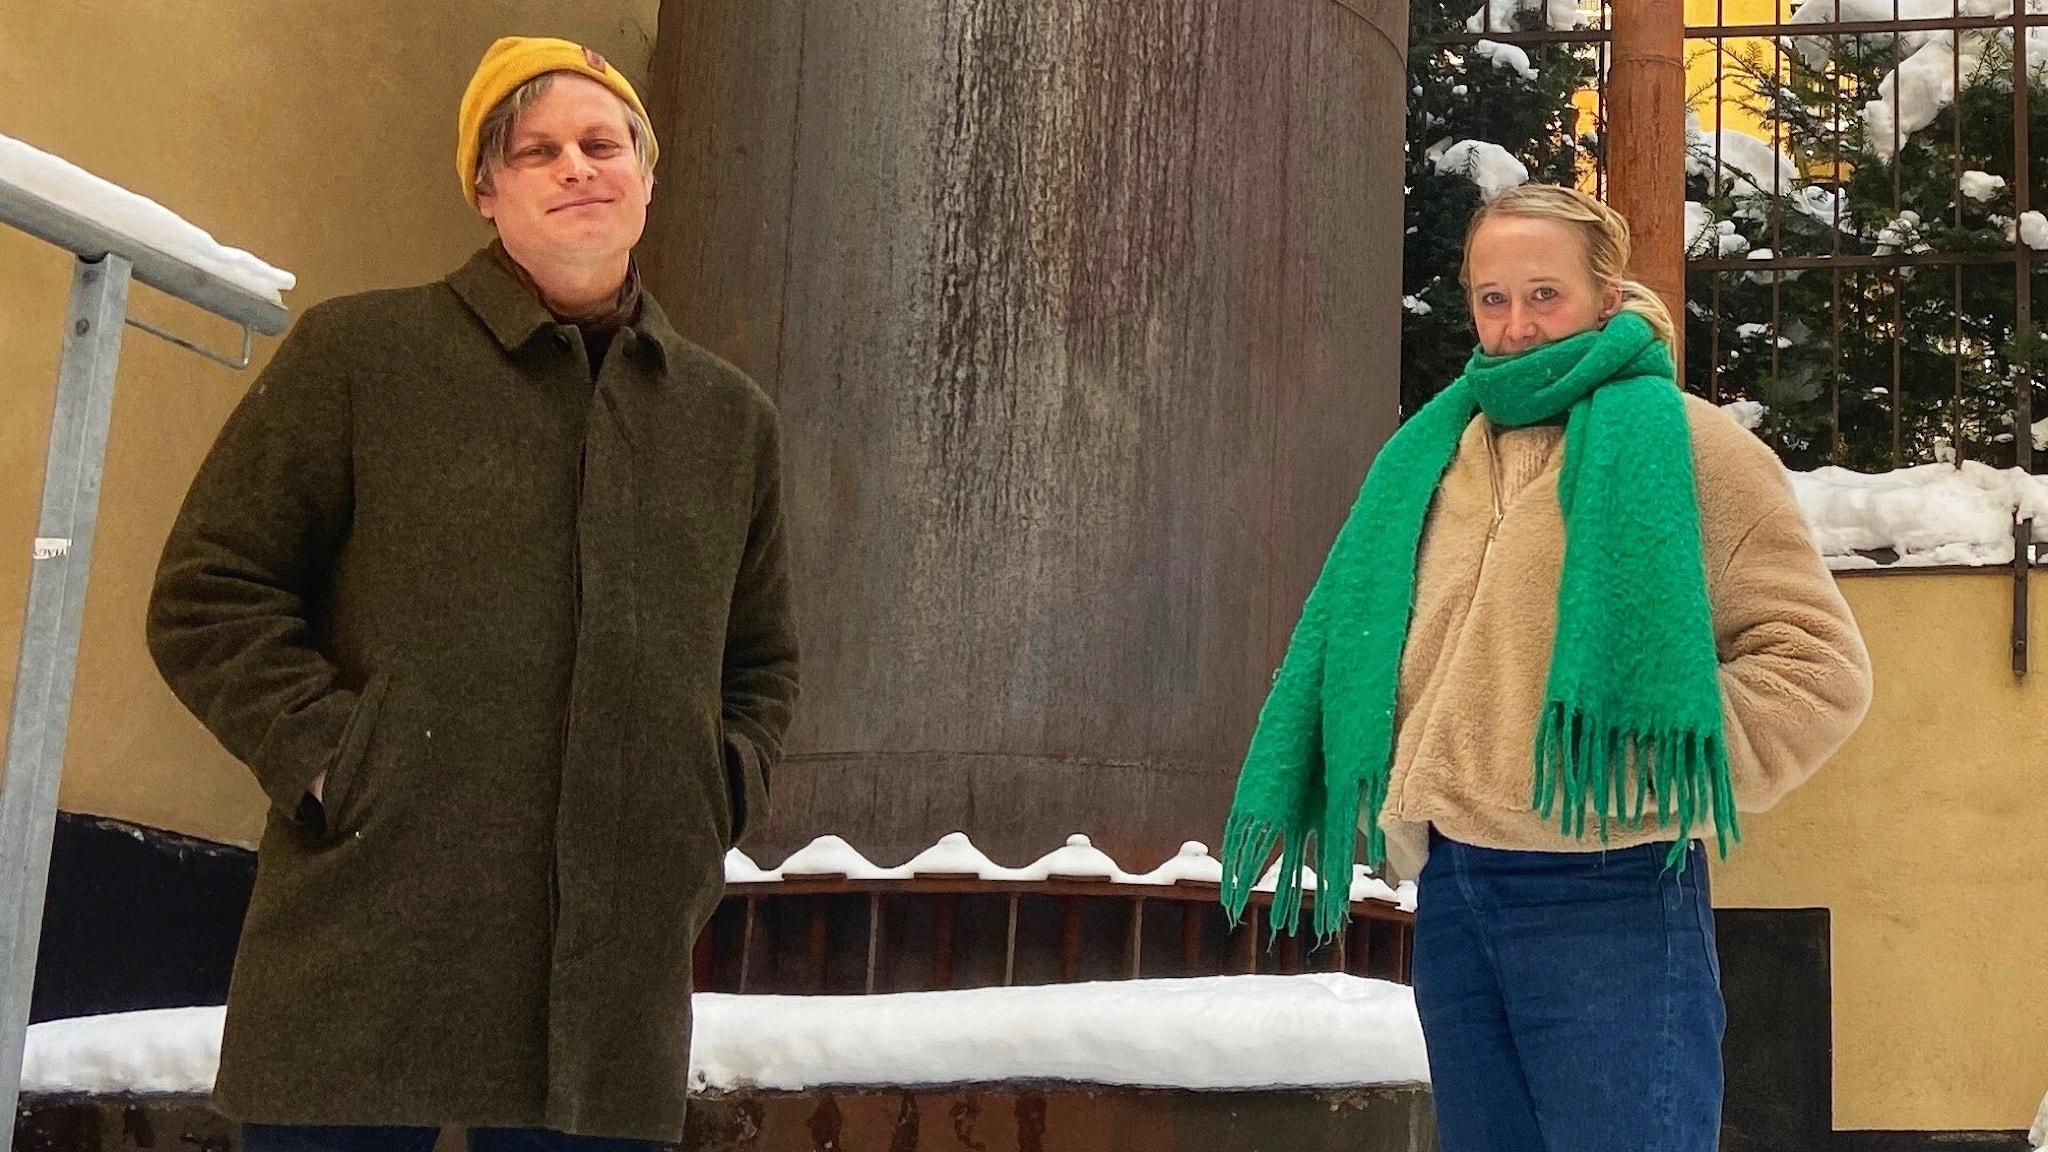 Martin Hederos och Anna Storåkers Foto Helene Almqvist